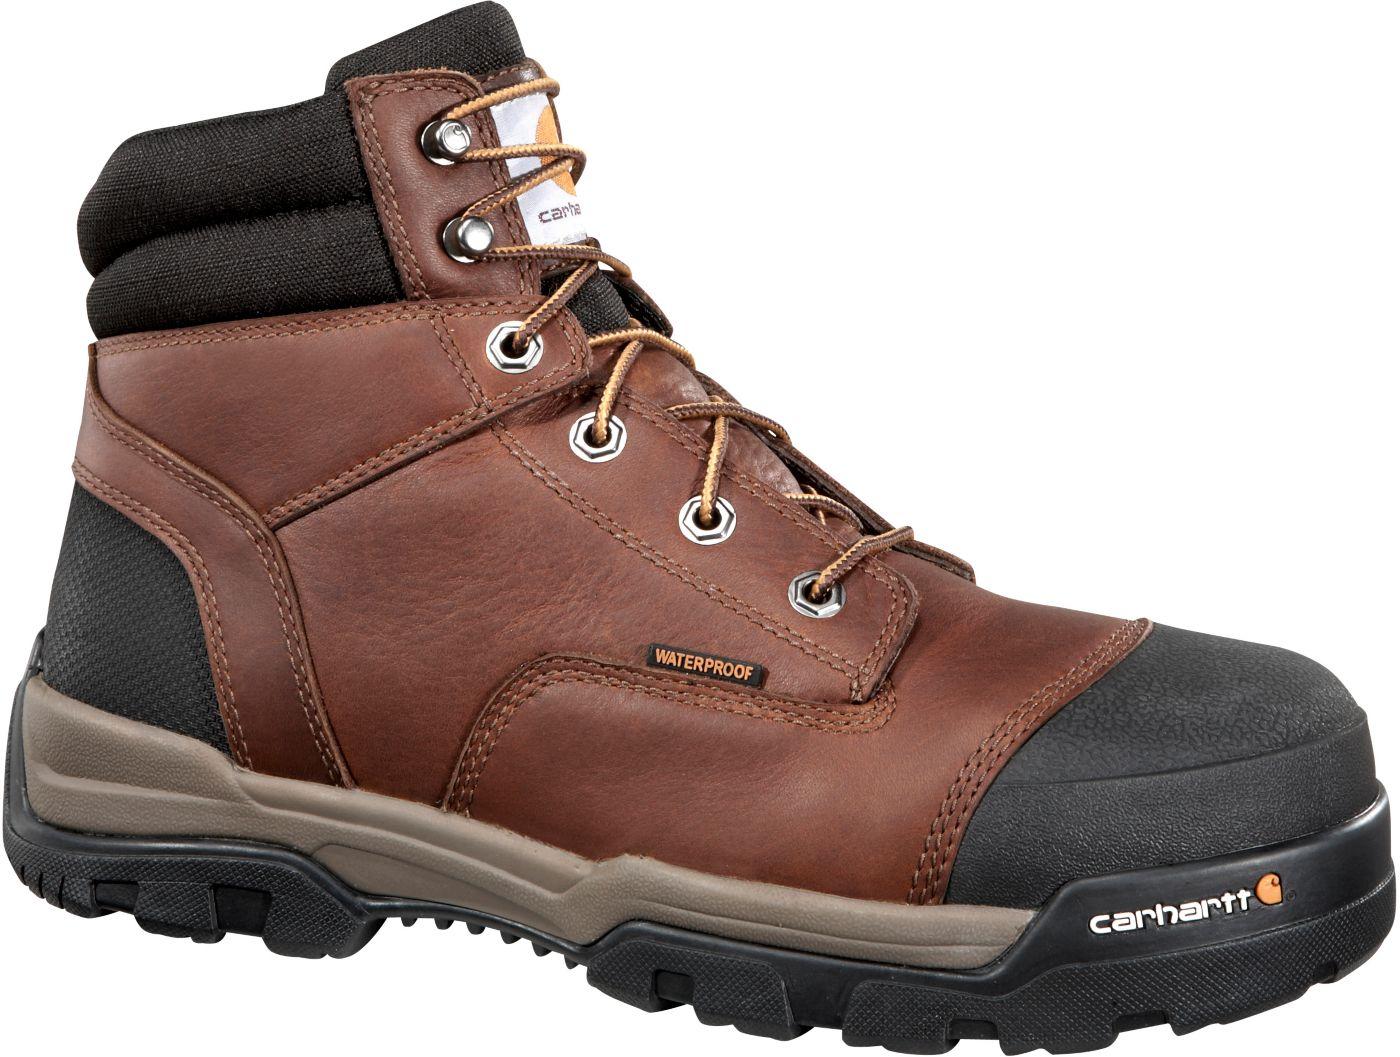 Carhartt Men's Ground Force 6'' Waterproof Work Boots